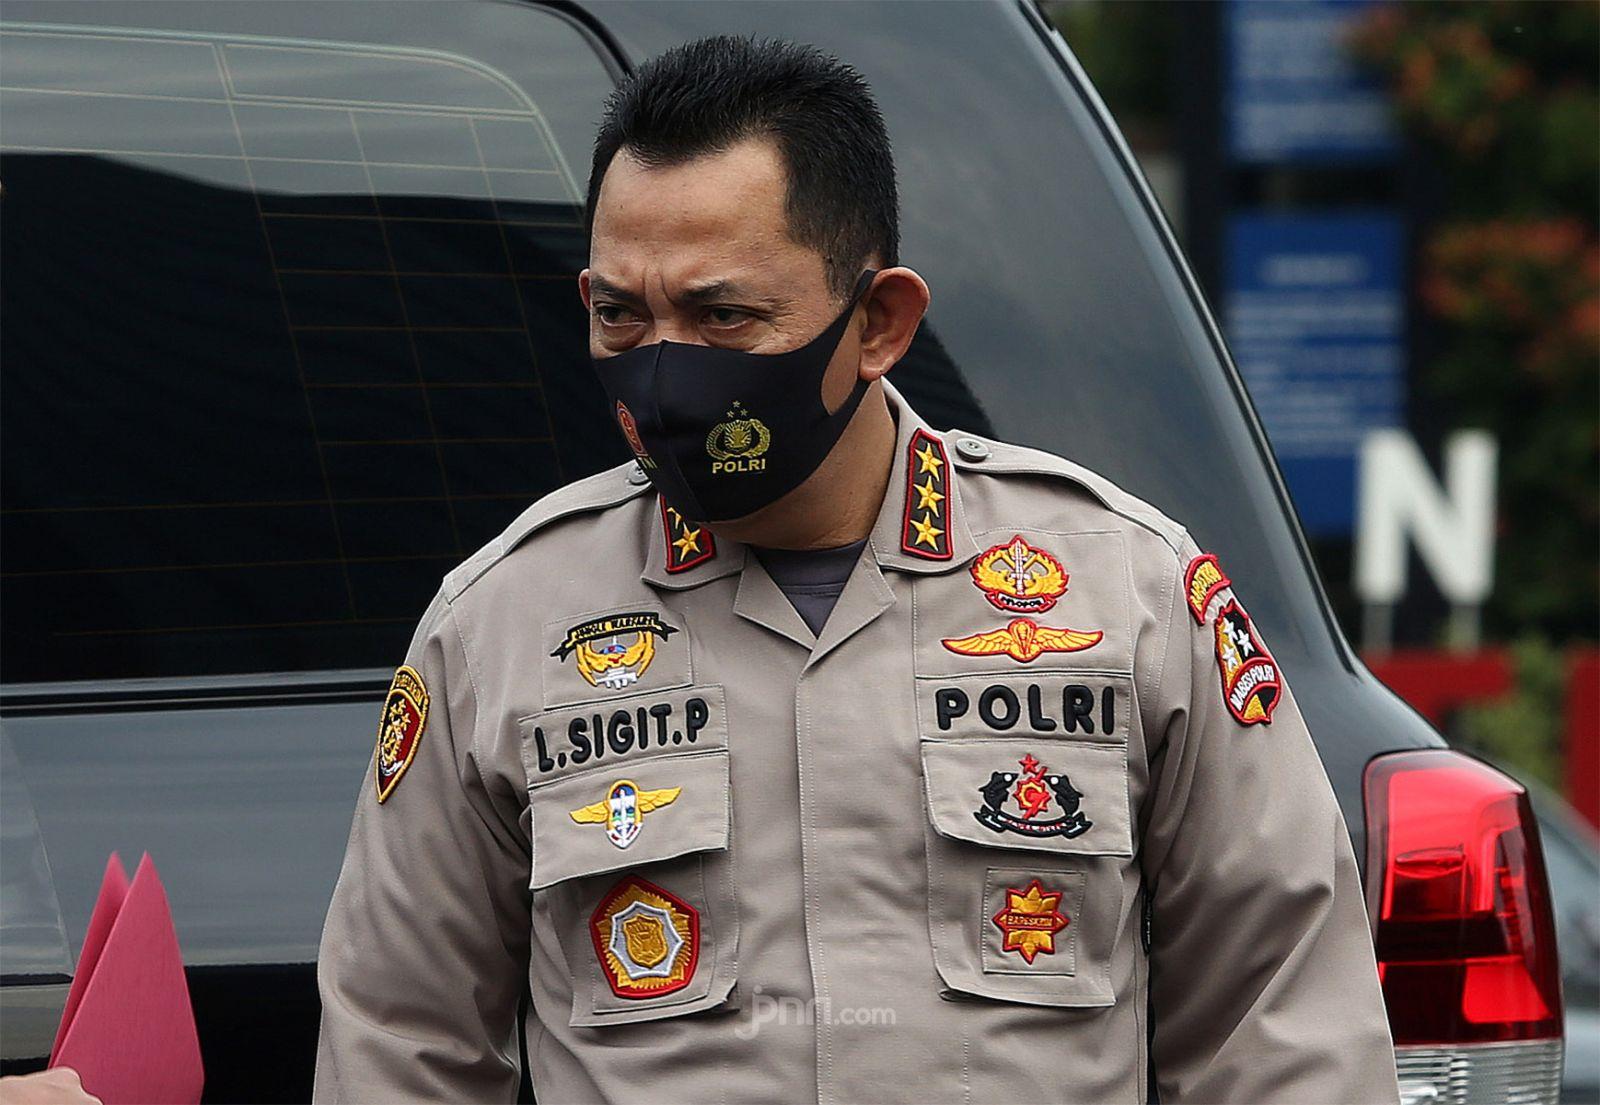 Ngeri! Pakar Intelijen Bongkar Kelompok yang Anti-Calon Kapolri